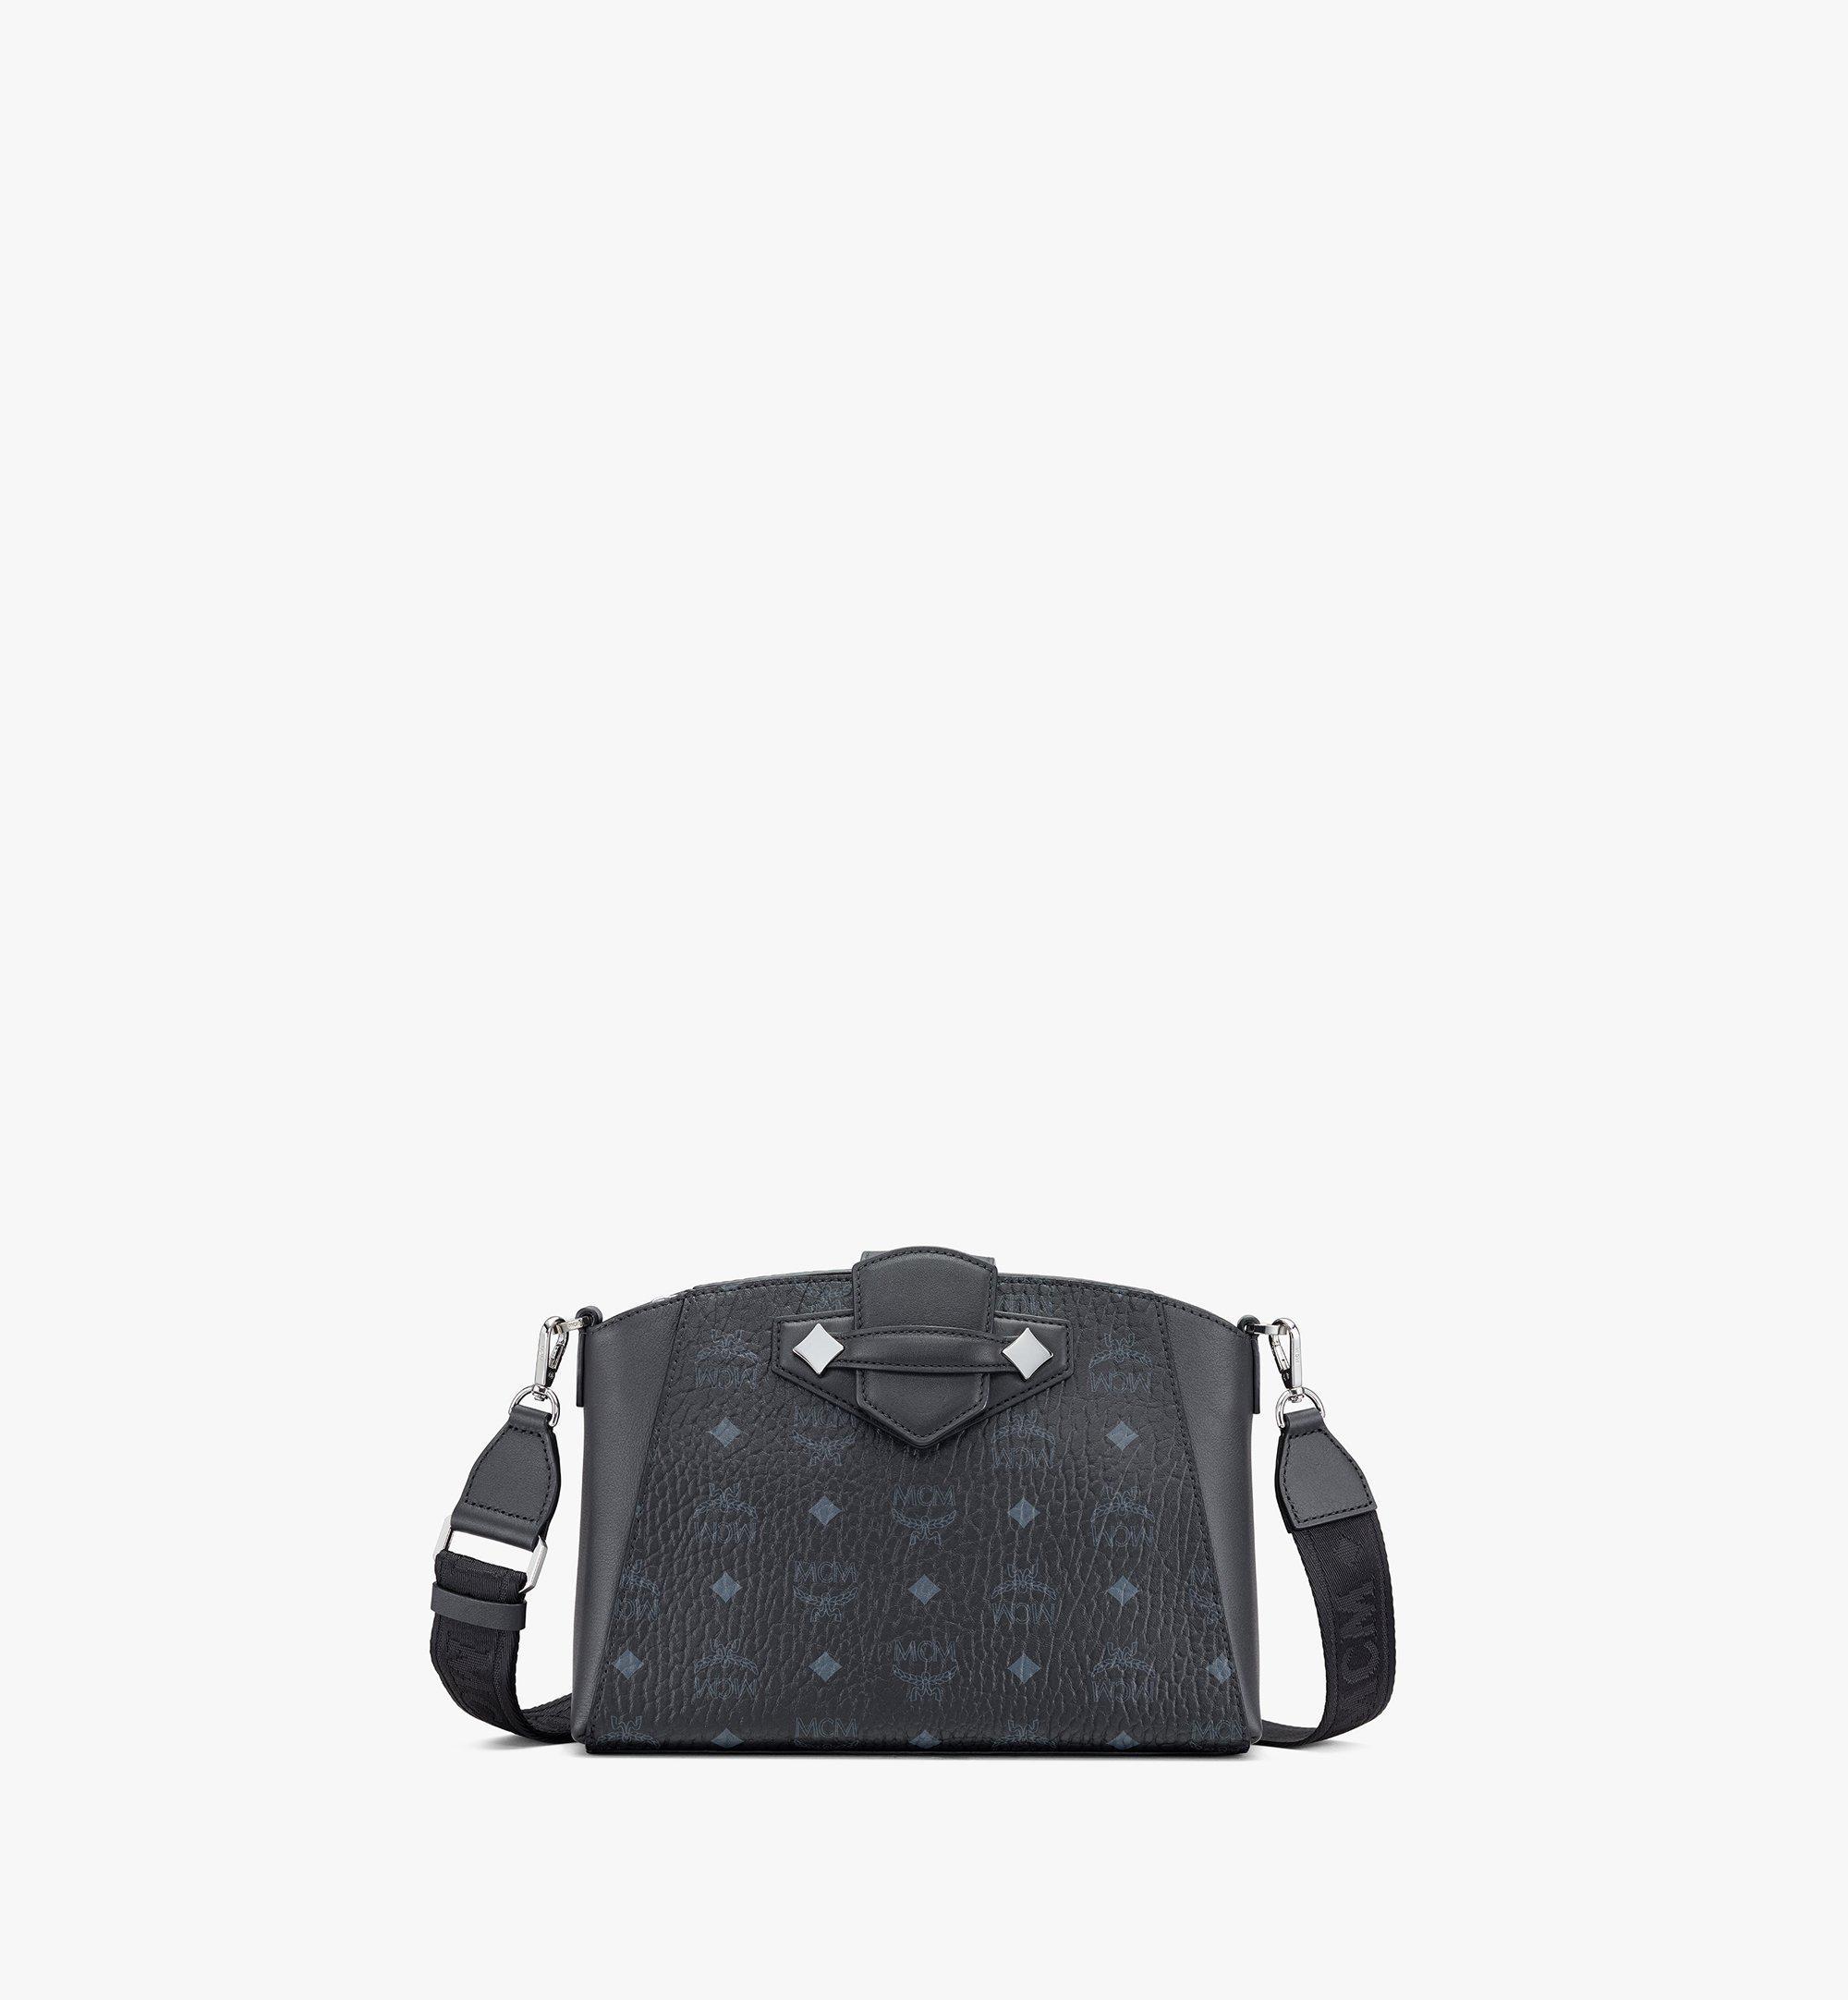 MCM Essential Crossbody Bag in Visetos Original Black MWRASSE07BK001 Alternate View 1